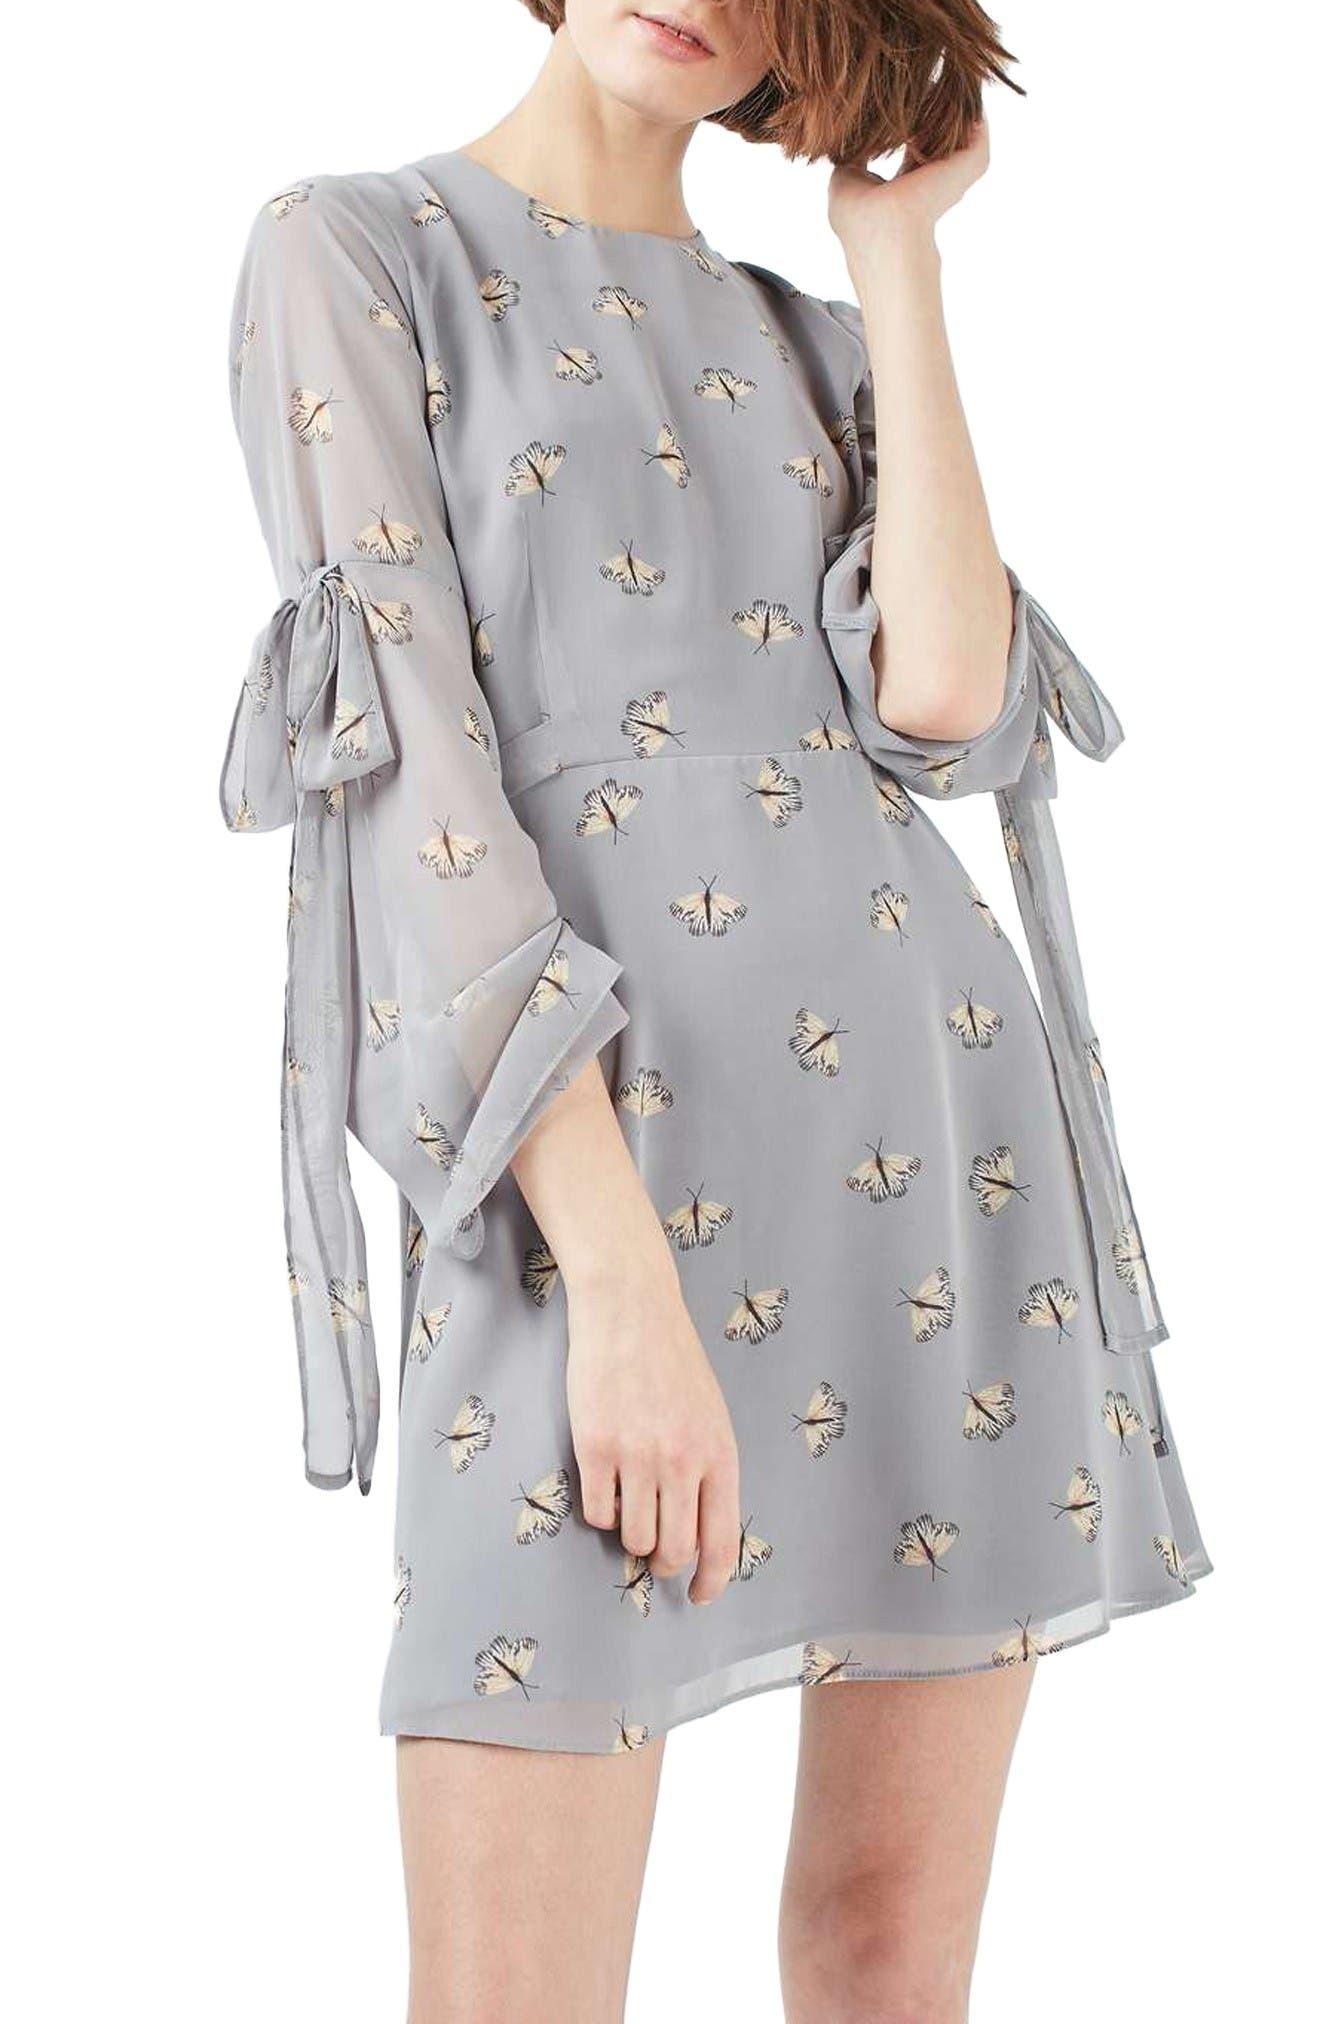 Alternate Image 1 Selected - Topshop Moth Print Skater Dress